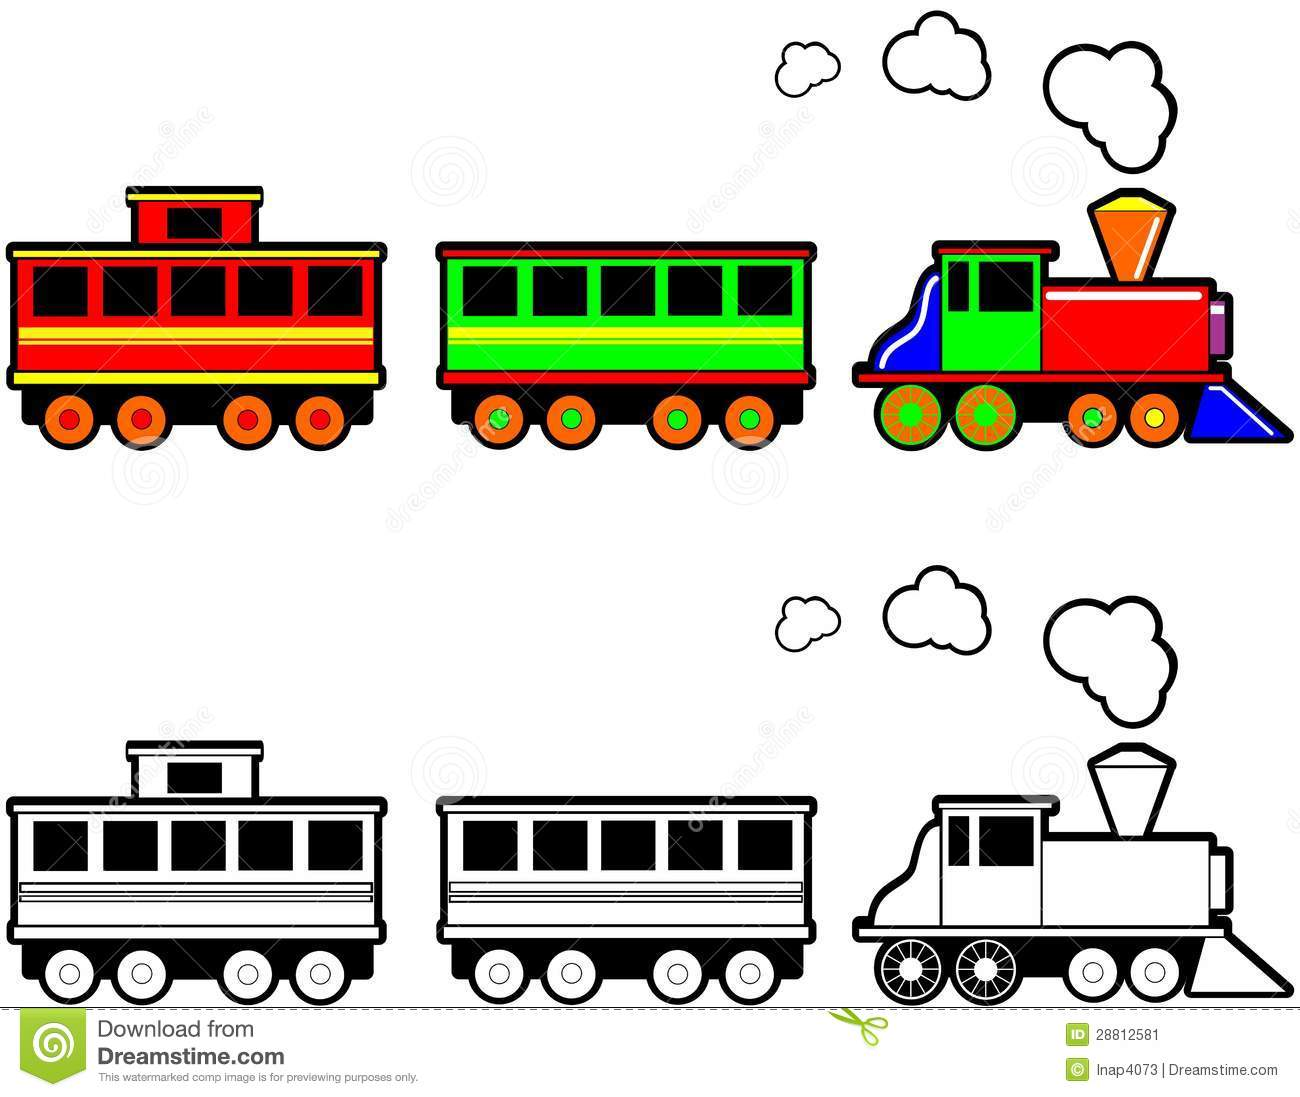 Train passenger car clipart.